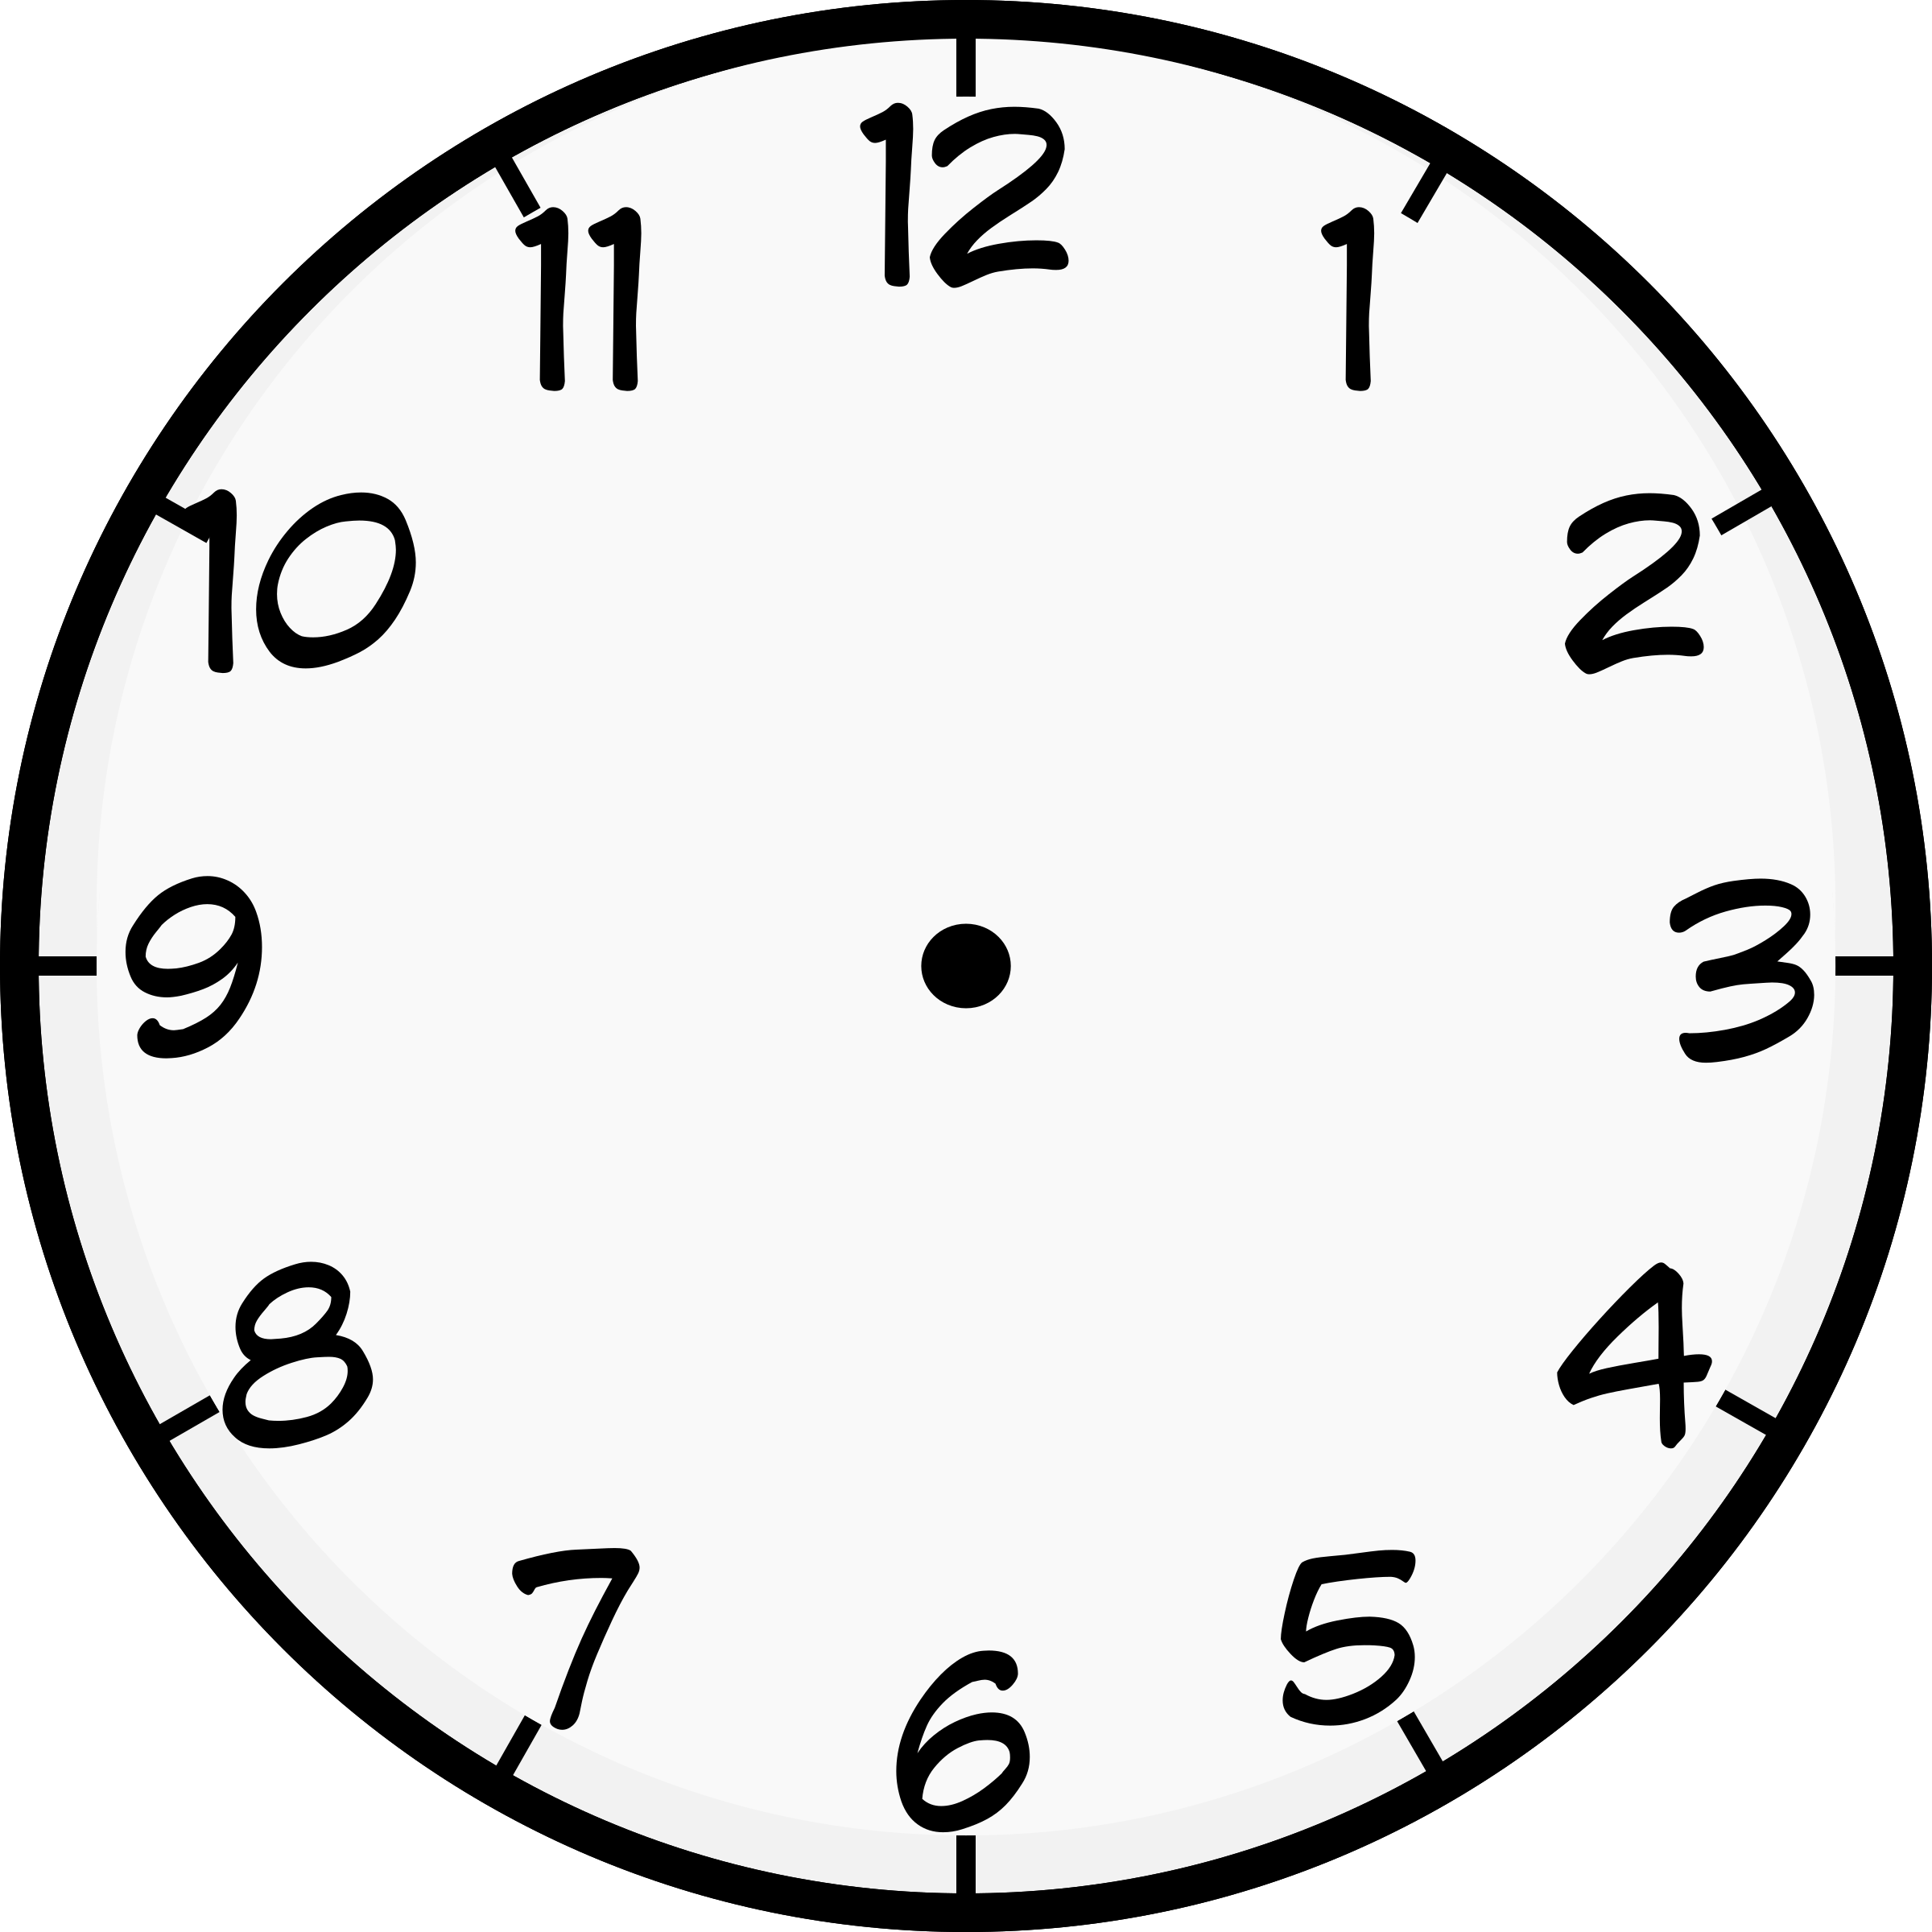 worksheet Face Of A Clock clipart clock face big image png